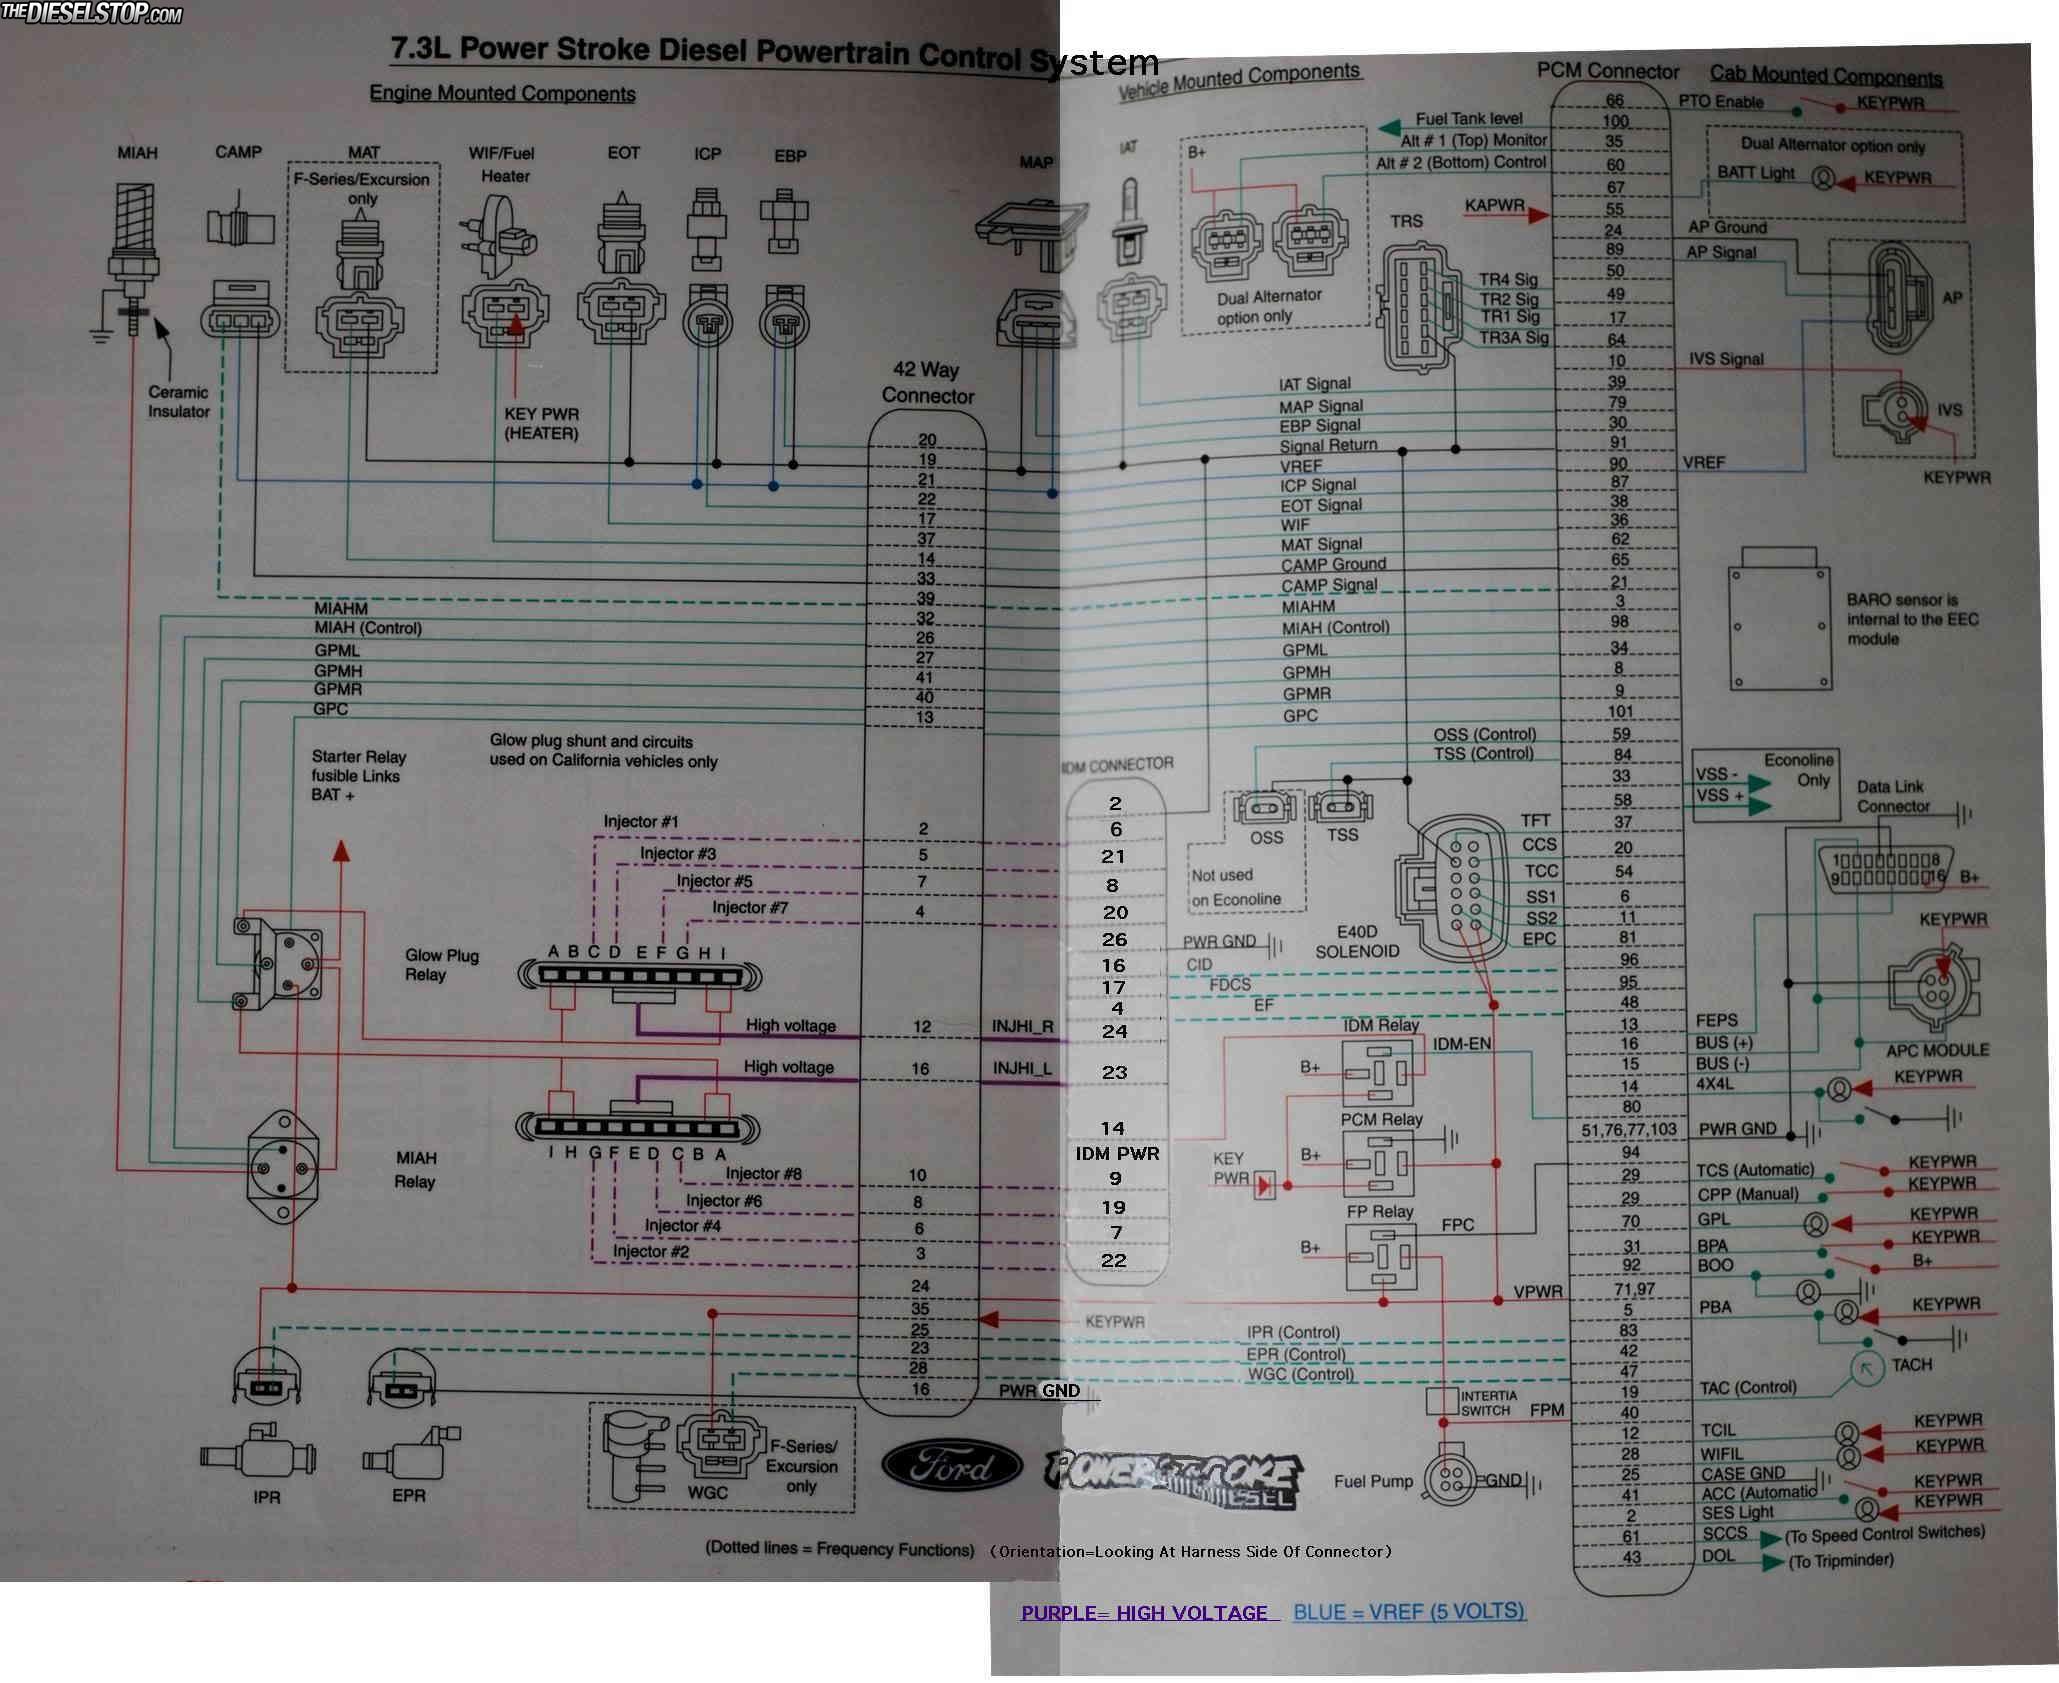 7.3L Wiring Schematic Printable, Very Handy. - Diesel Forum - 7.3 Powerstroke Wiring Diagram